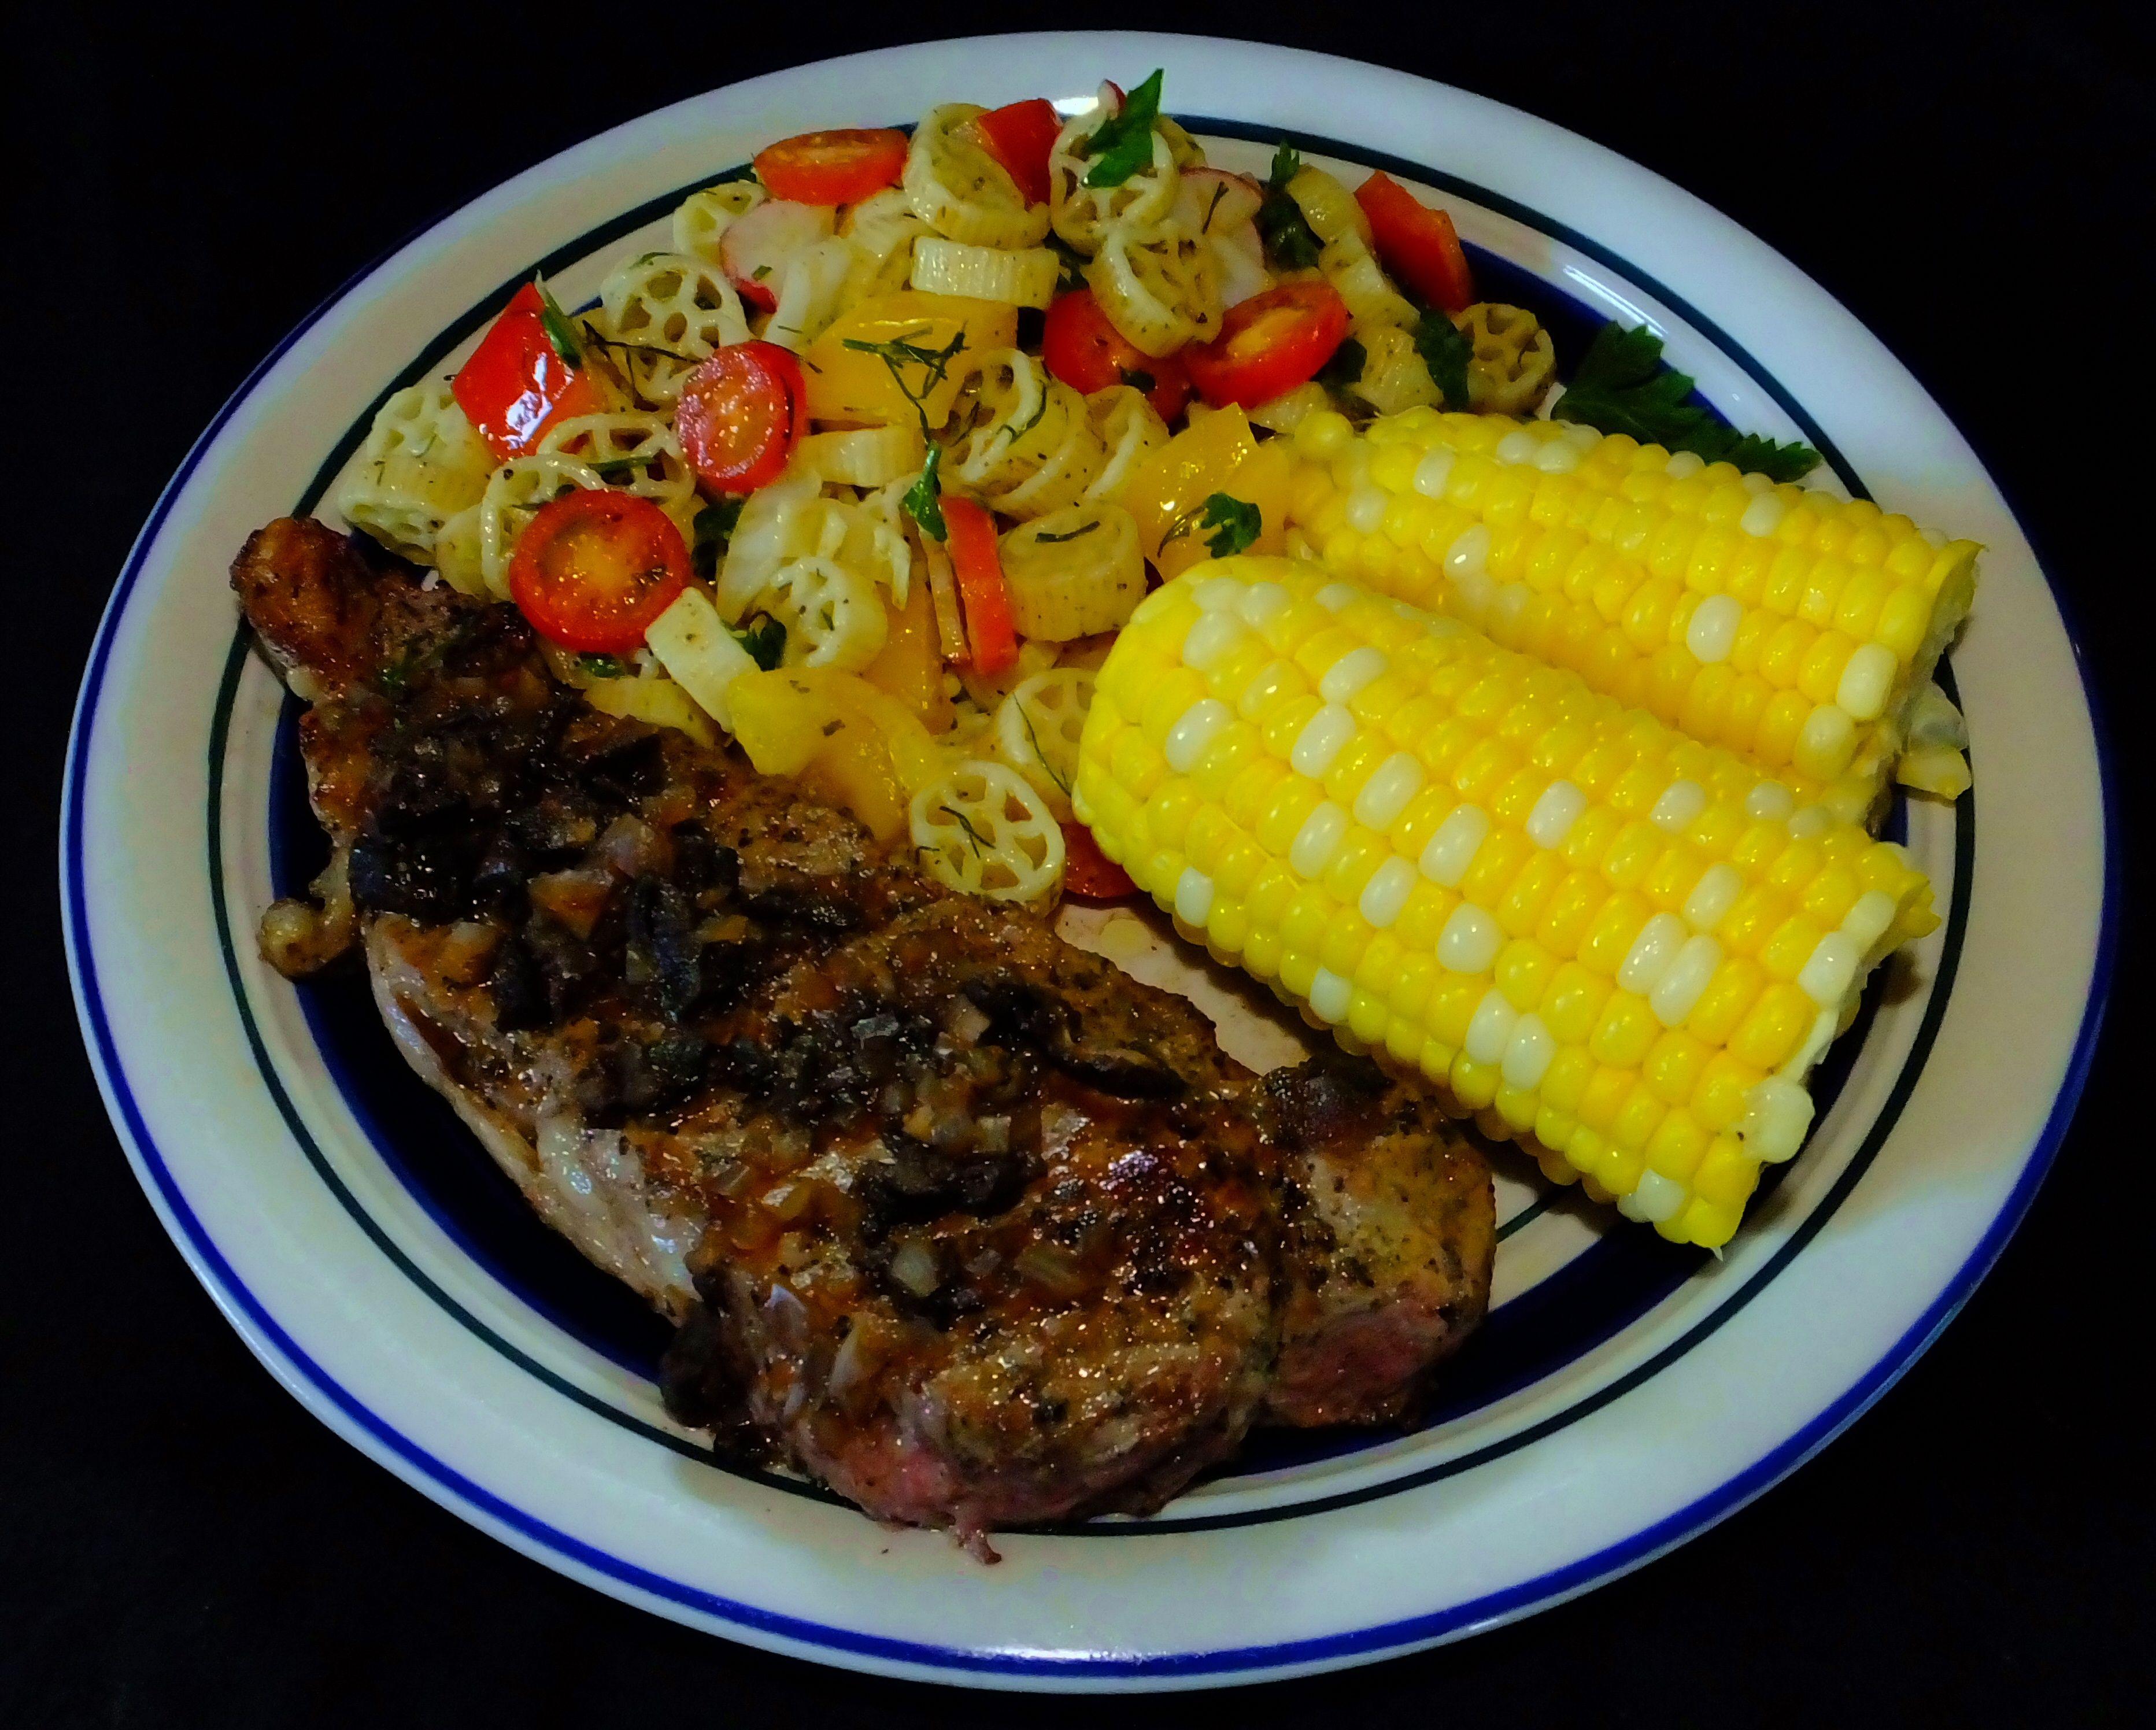 Strip Loin Steak with Shitake Mushroom & Bourbon Anjou #StripLoin #Steak #ShitakeMushrooms #Bourbon #Anjou #Corn #WagonWheel #Pasta #Salad